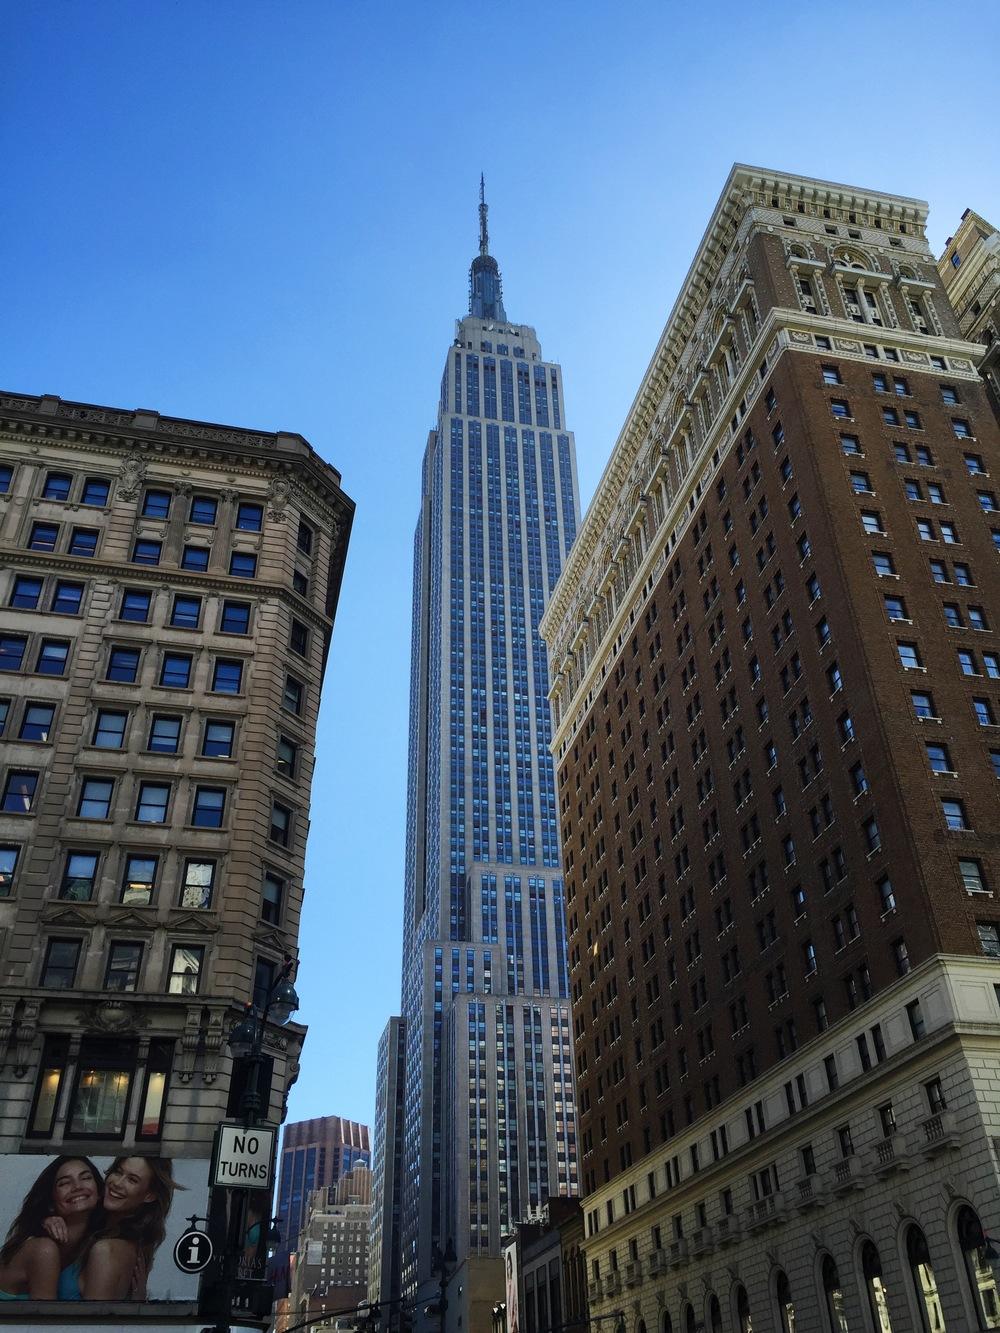 LaurenSchwaiger-Life-Style-Travel-Blog-NYC-Empire-State.jpg